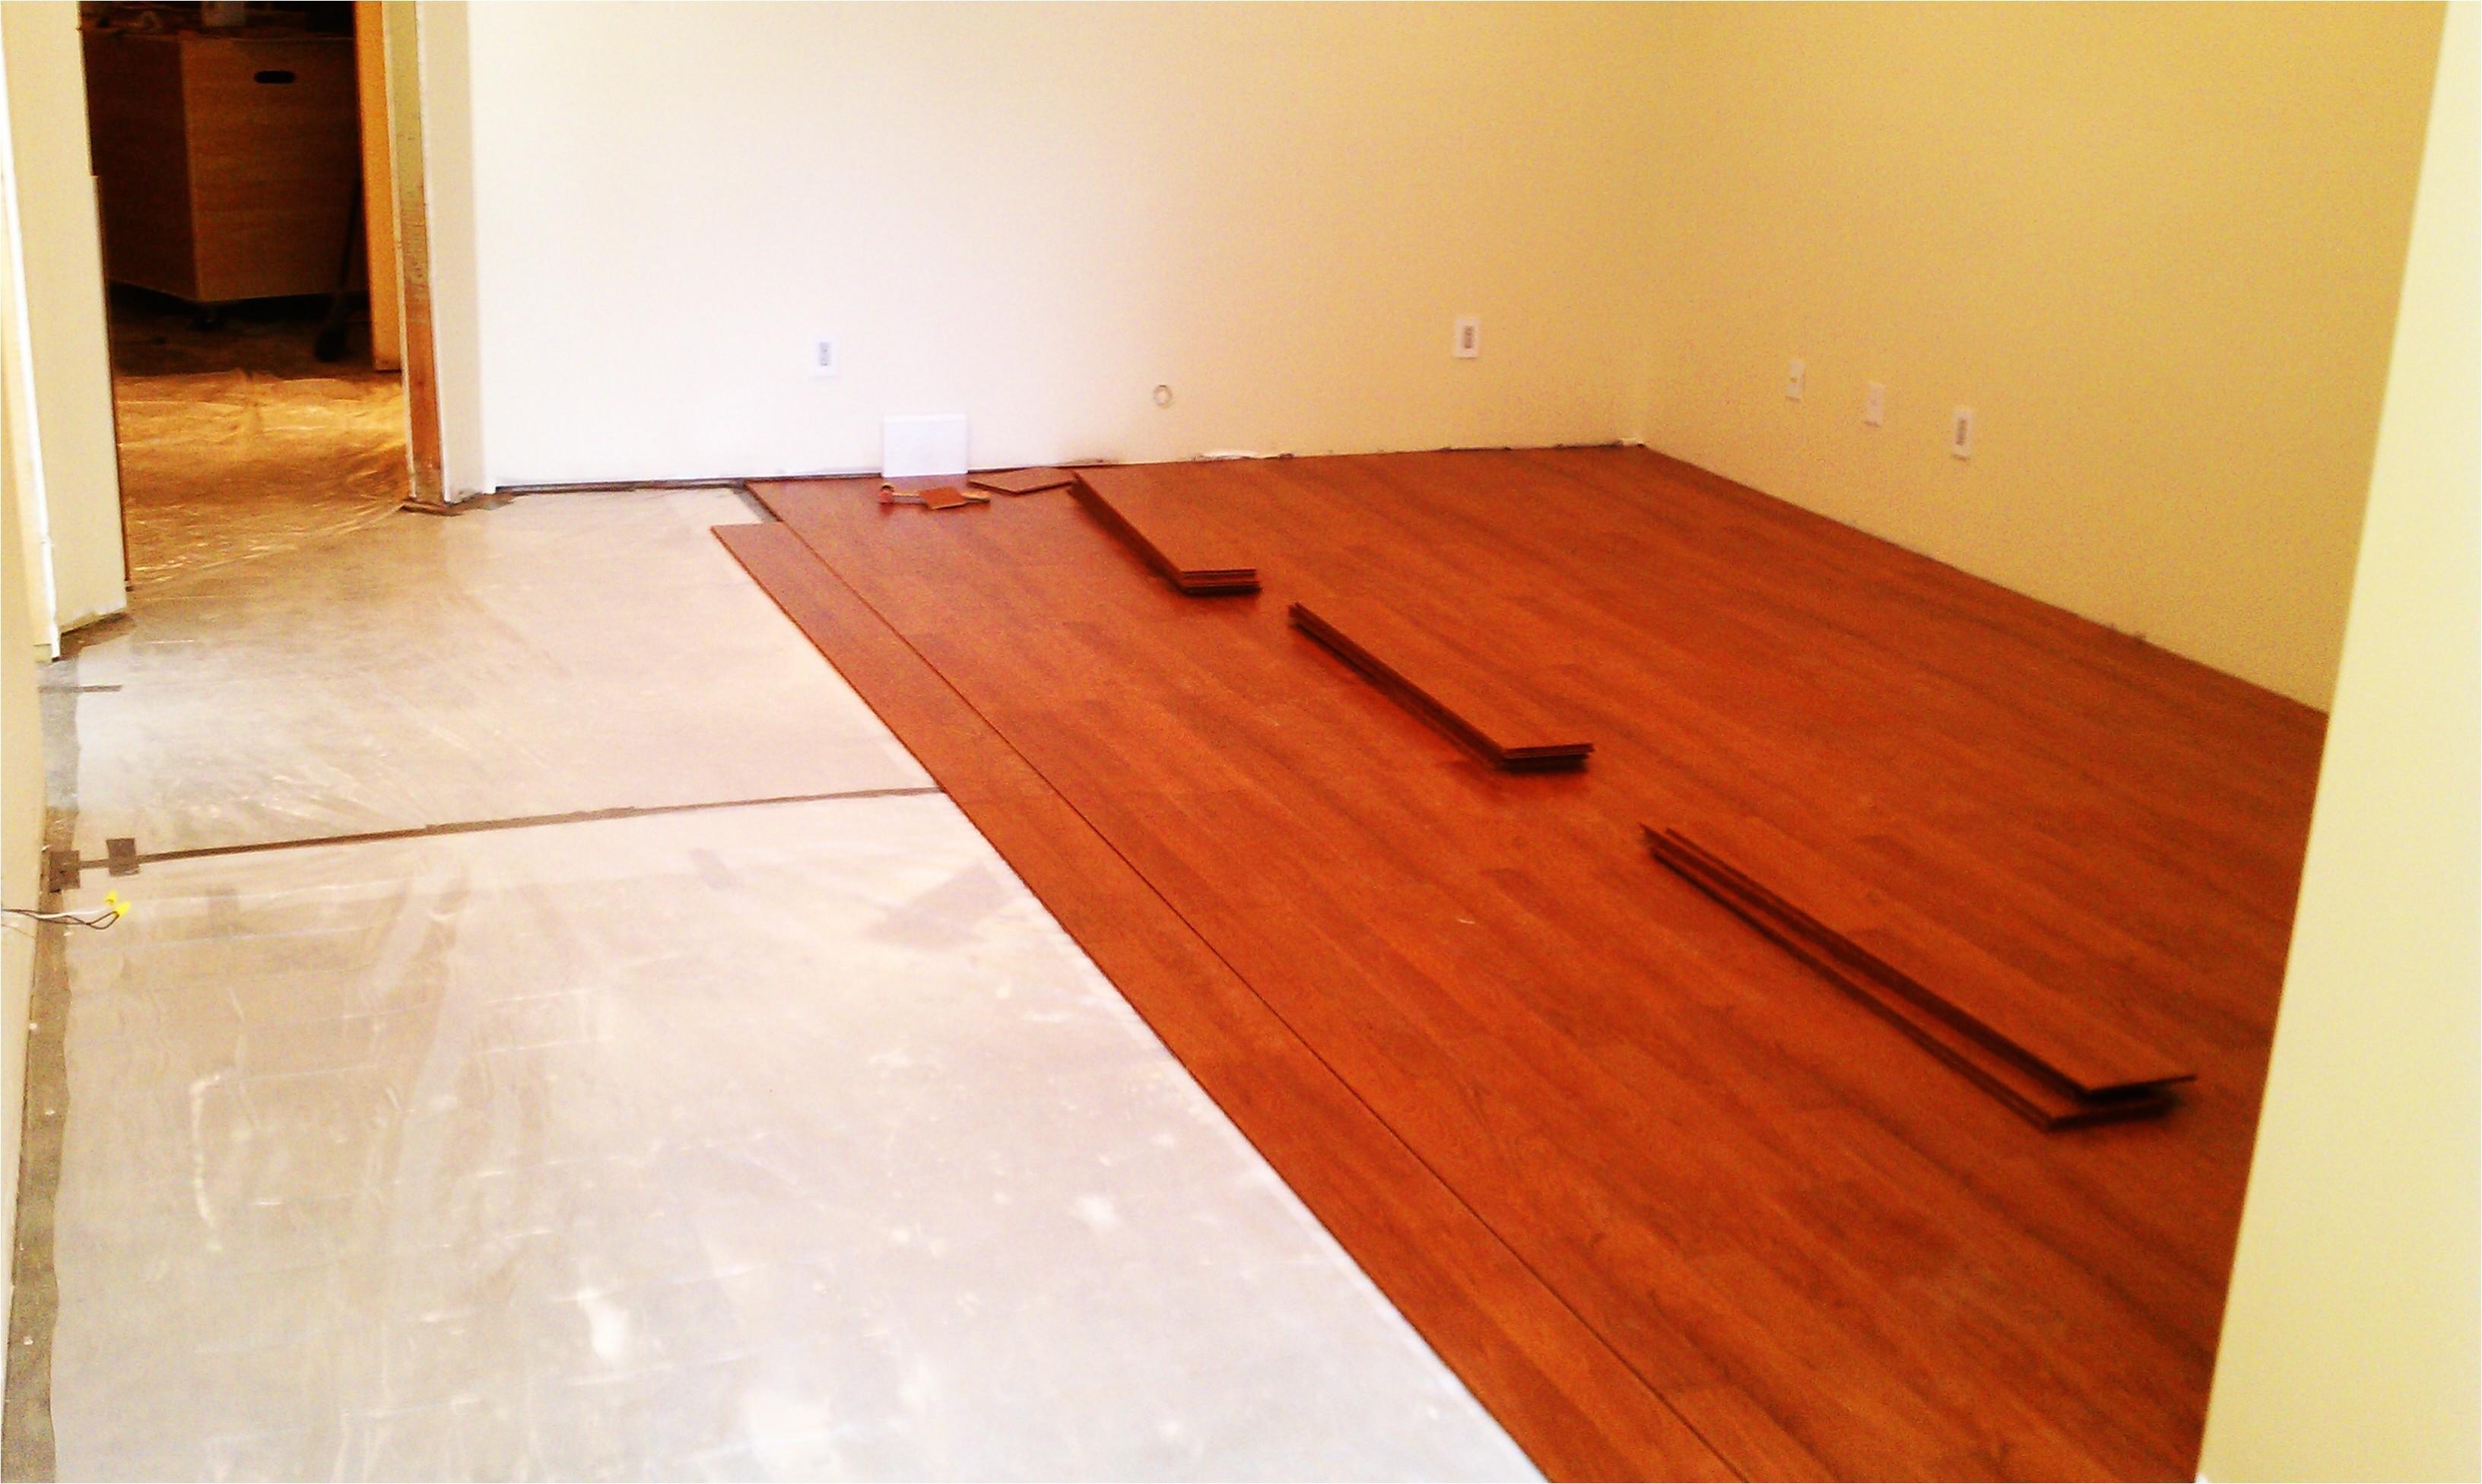 17852 good laminate flooring for basements